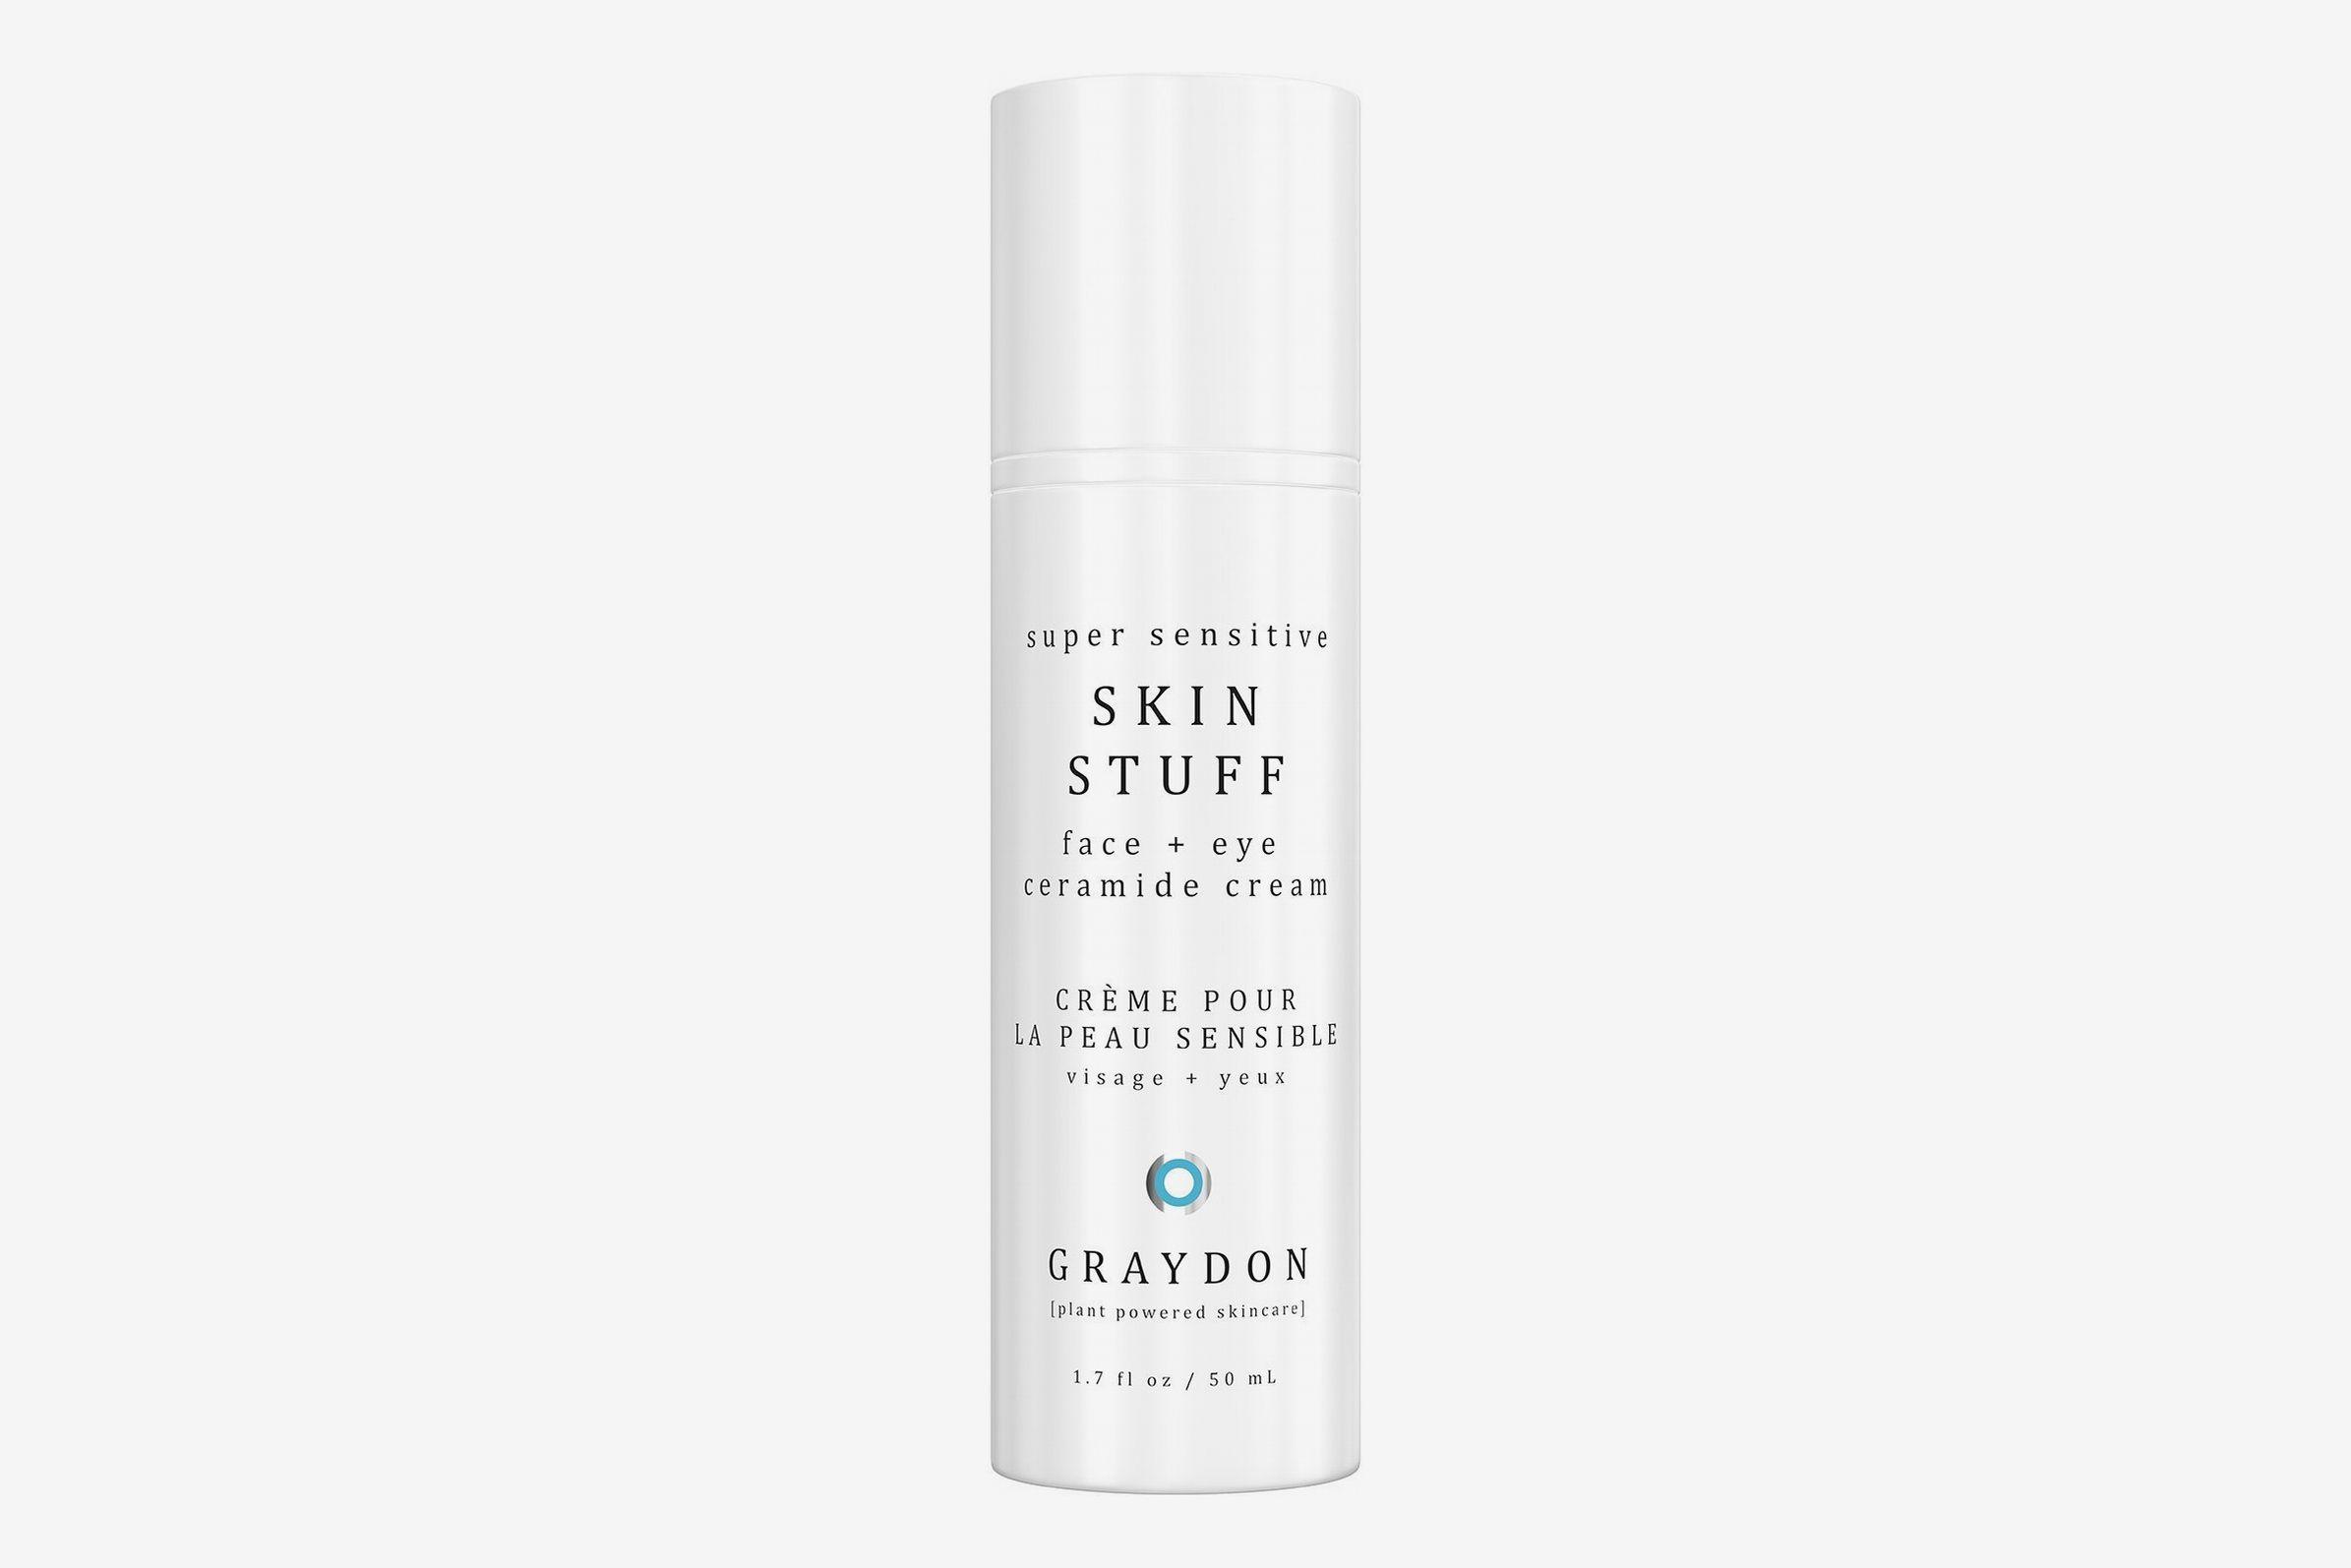 Graydon Super Sensitive Skin Stuff